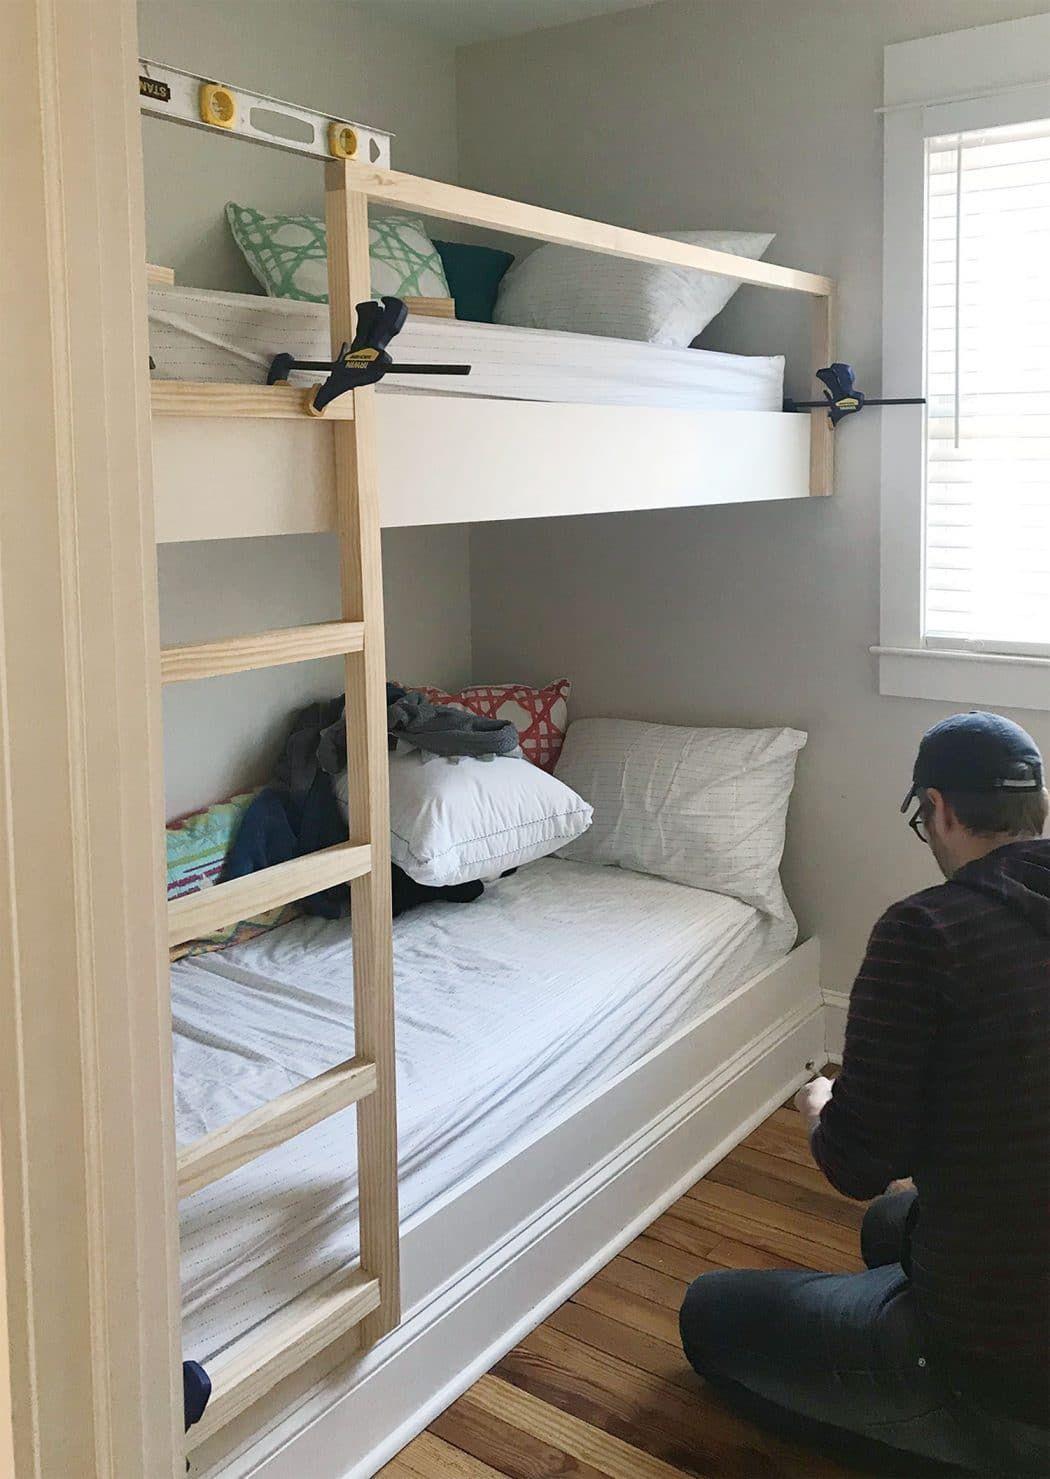 BuiltIn Bunk Beds Ideas To Make An Enjoyable Bedroom Design in